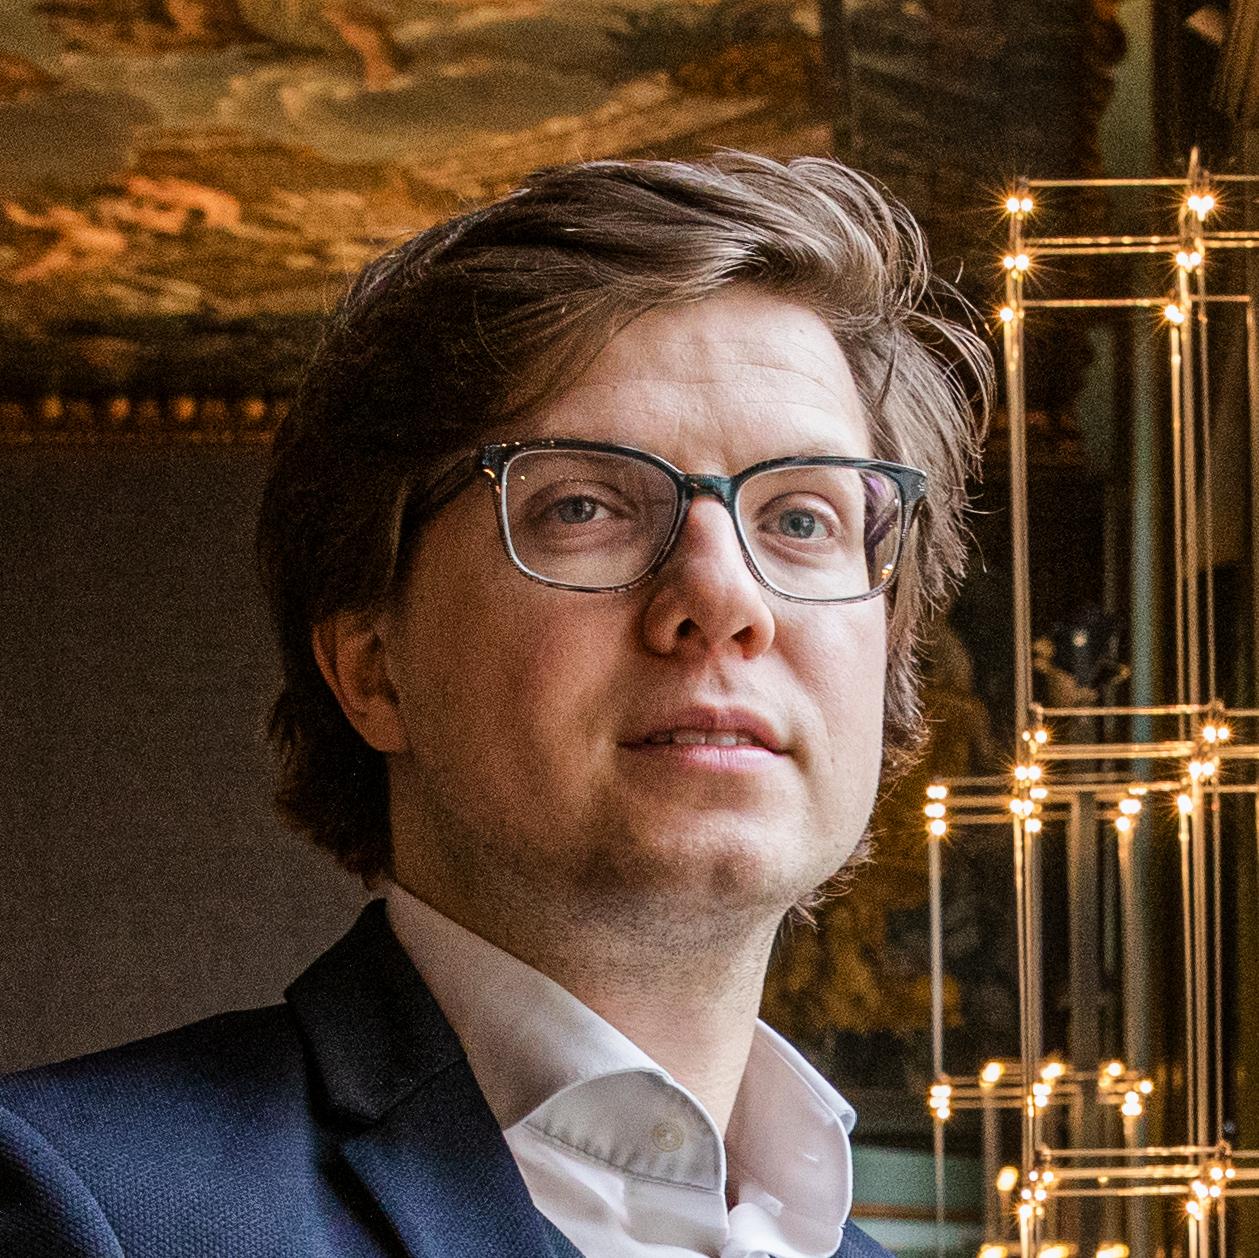 Matthias Francken